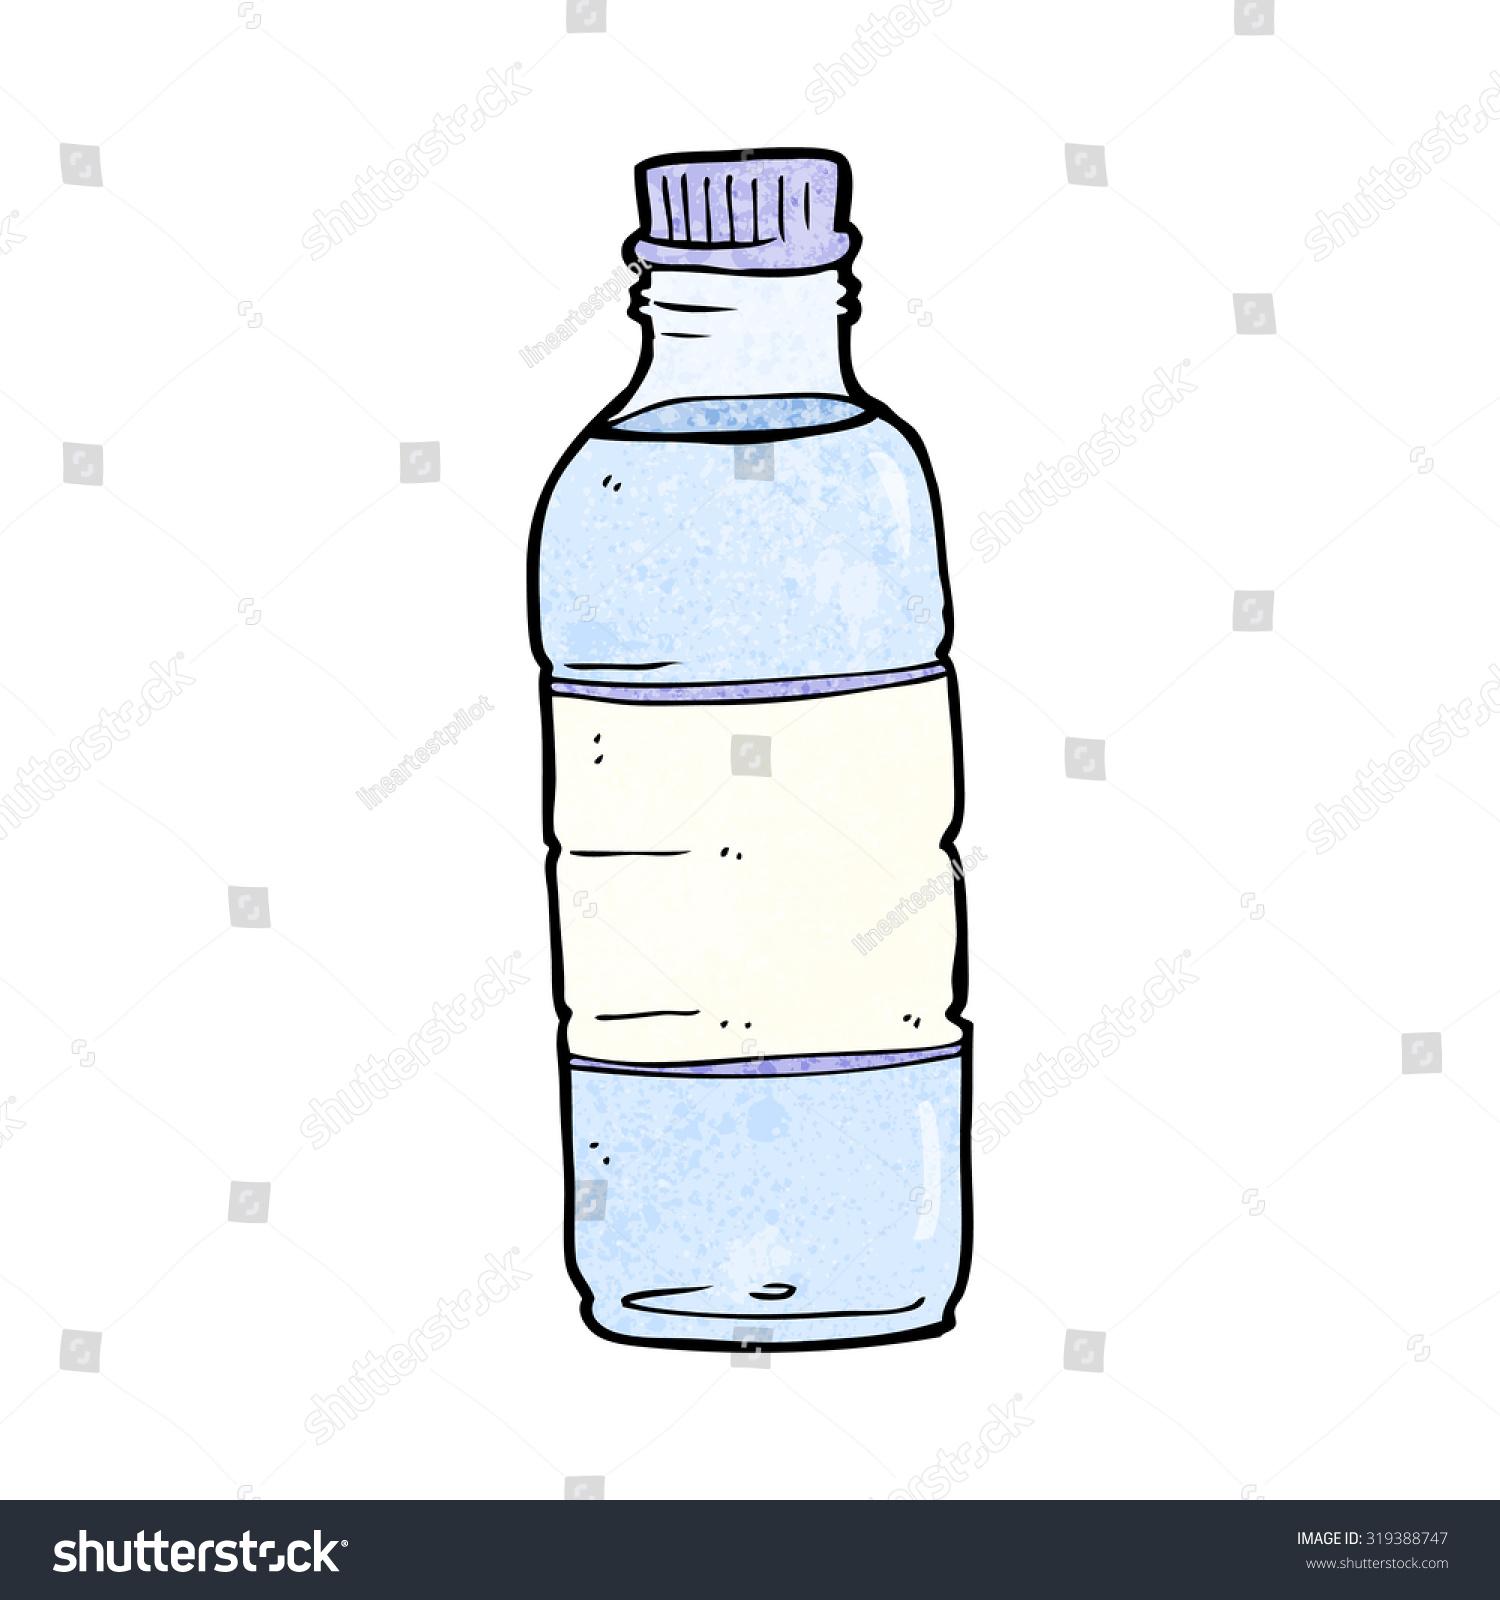 cartoon water bottle stock illustration 319388747 shutterstock